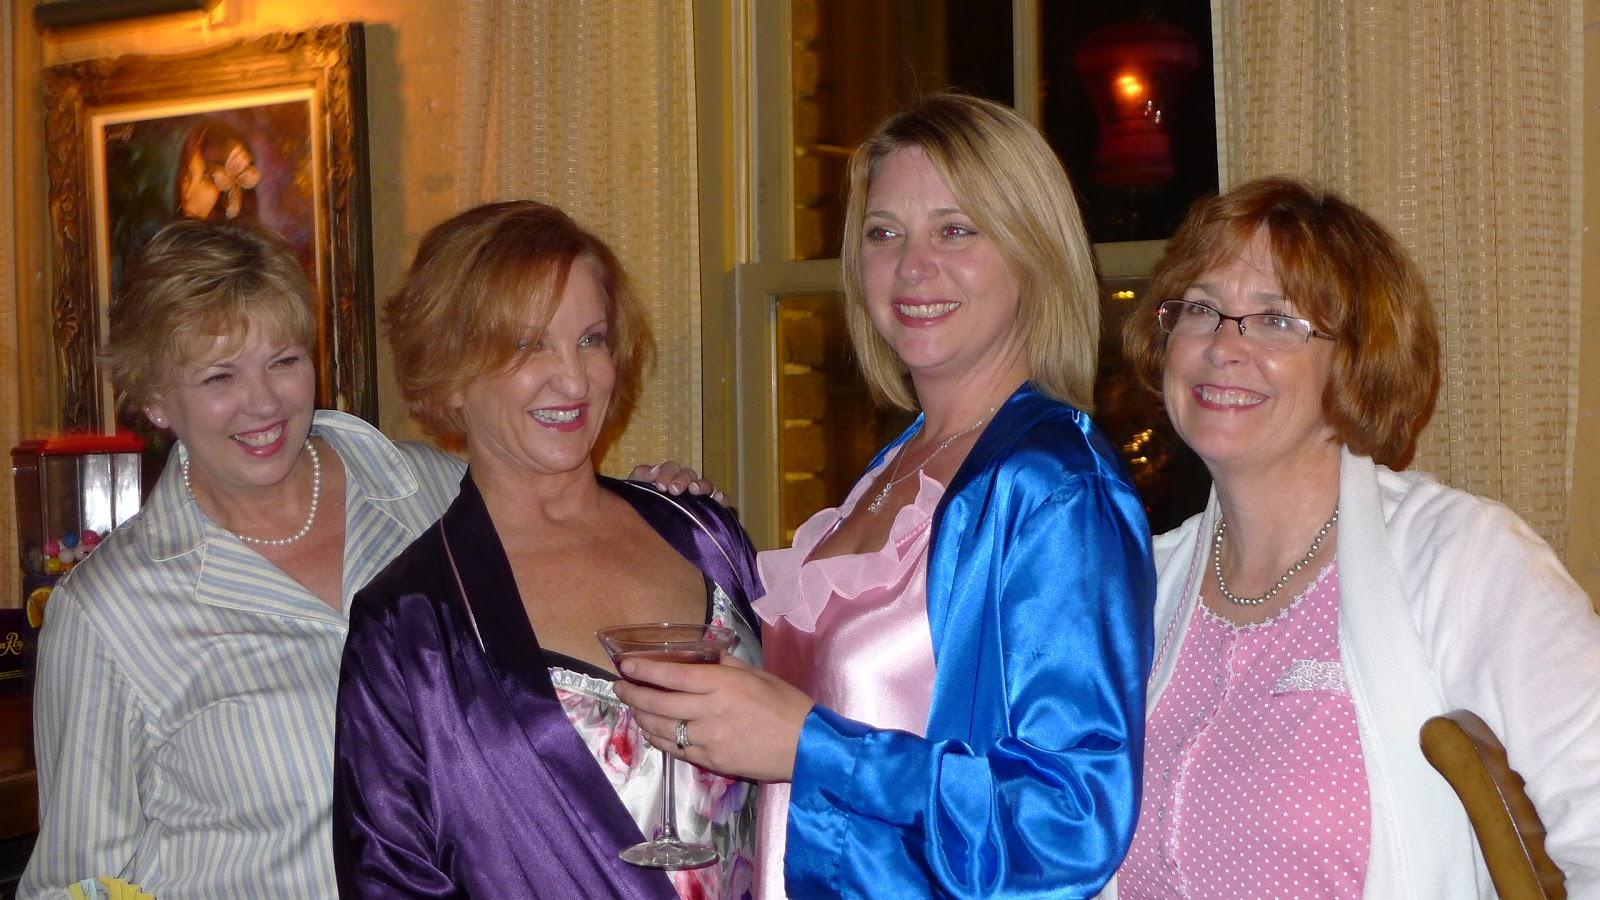 Peaks   Potholes  Girl s Roadtrip  Savannah Pajama Party! 134dbbb54